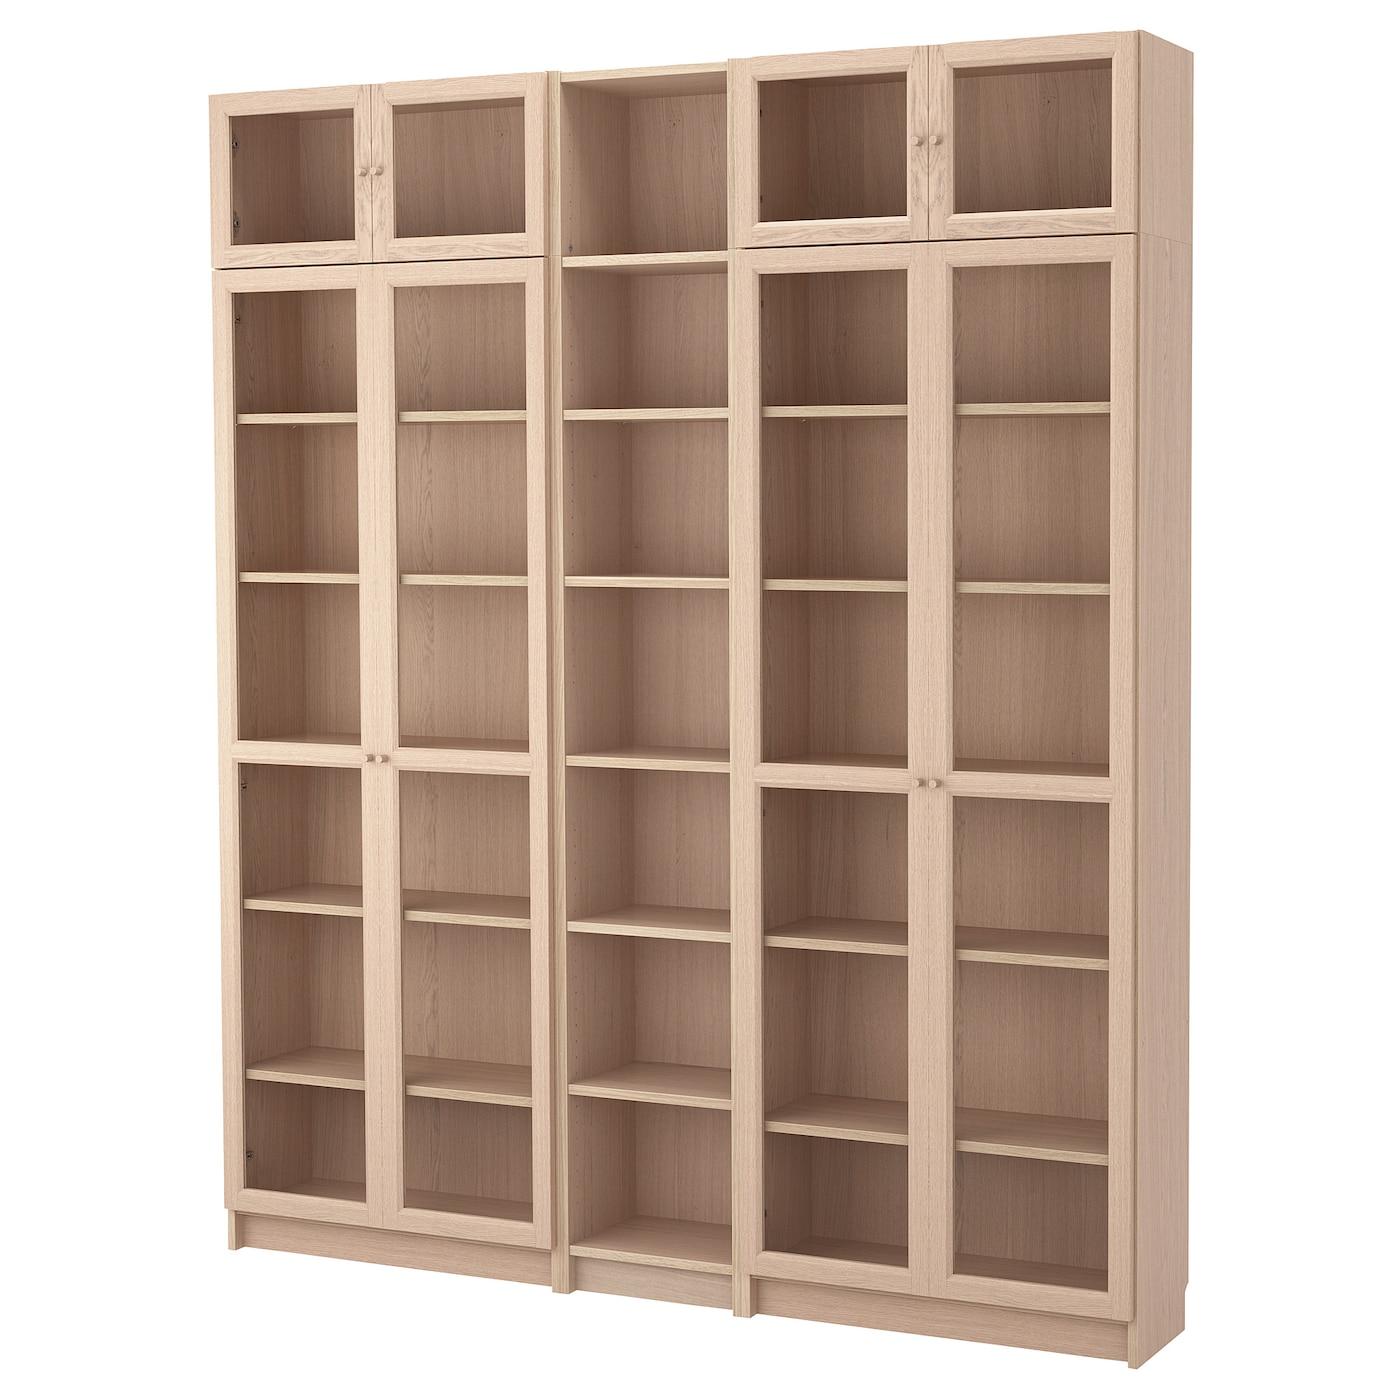 Ikea for Mueble libreria ikea